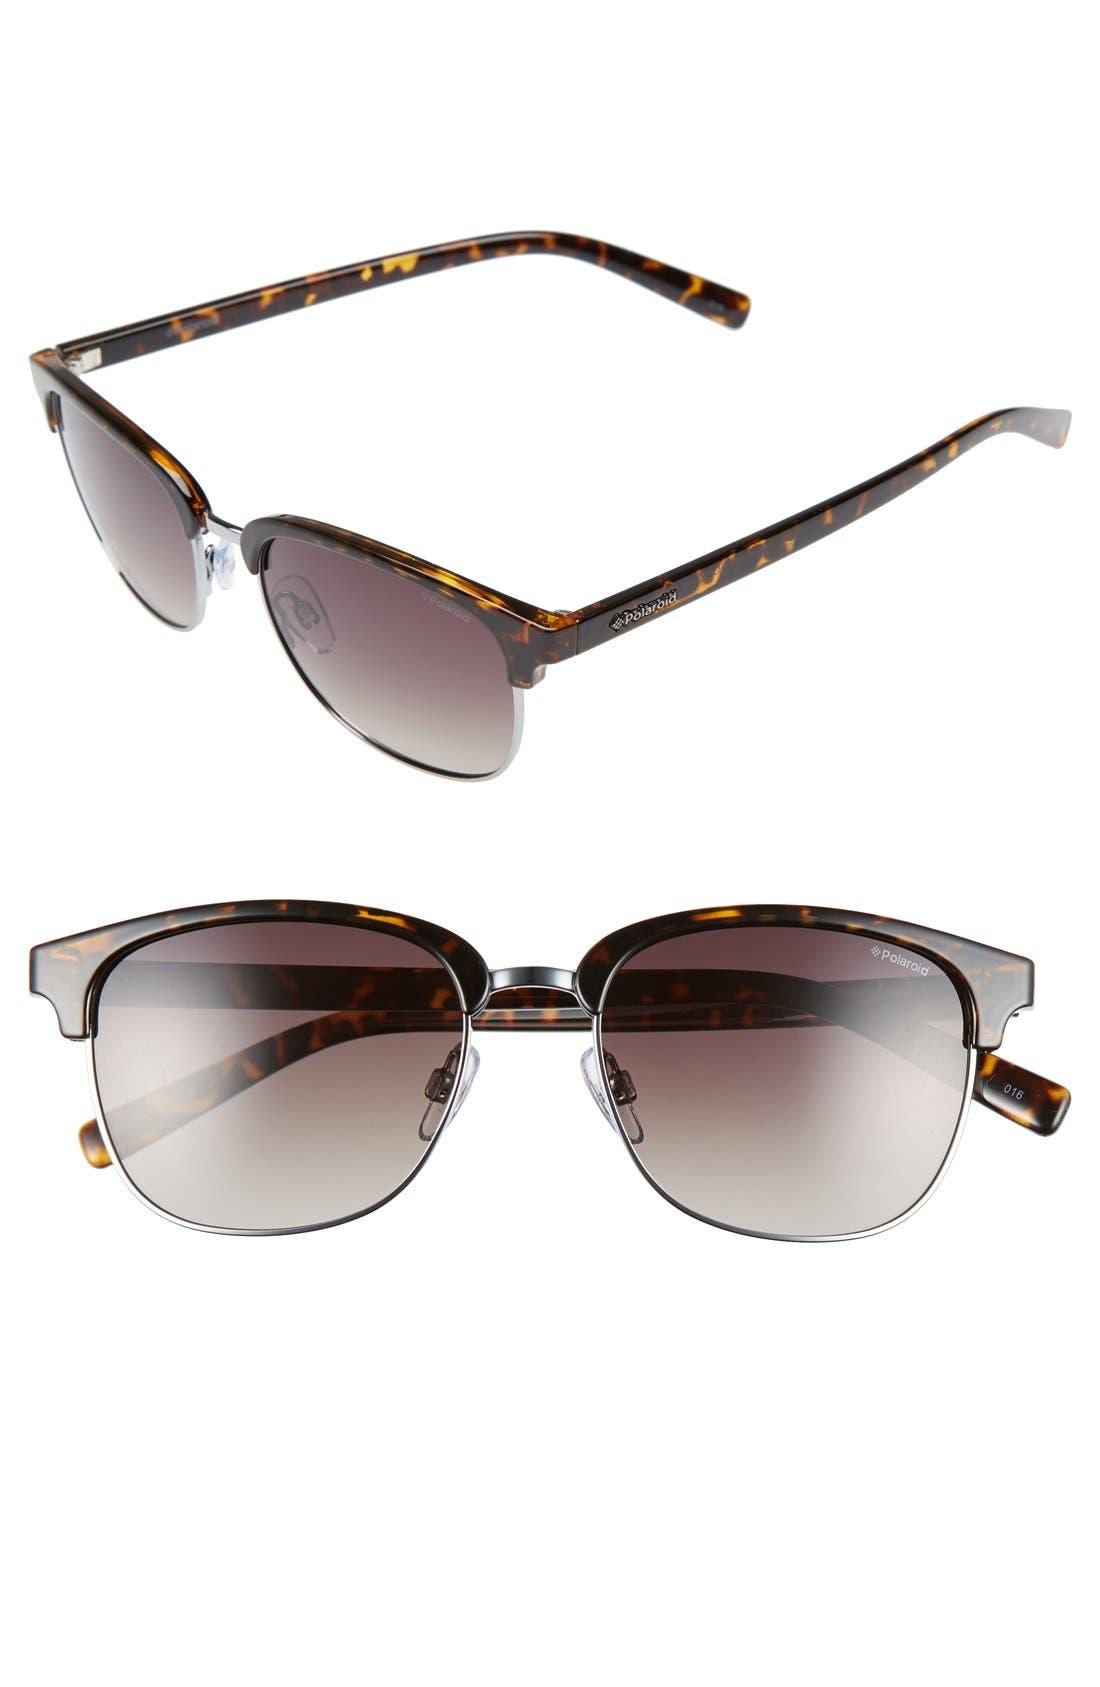 55mm Polarized Sunglasses,                             Main thumbnail 1, color,                             045